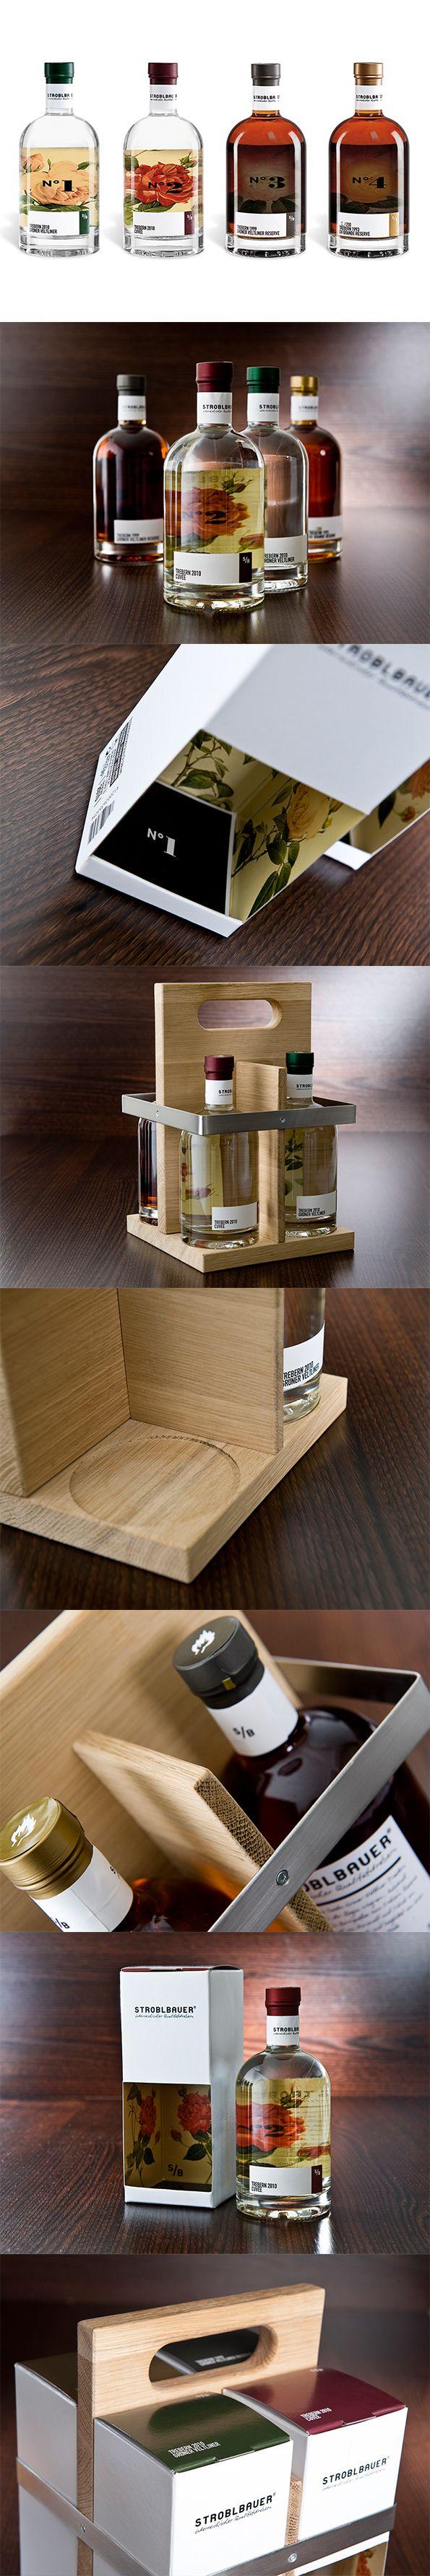 STROBLBAUER // Packaging: By strobl-kriegner